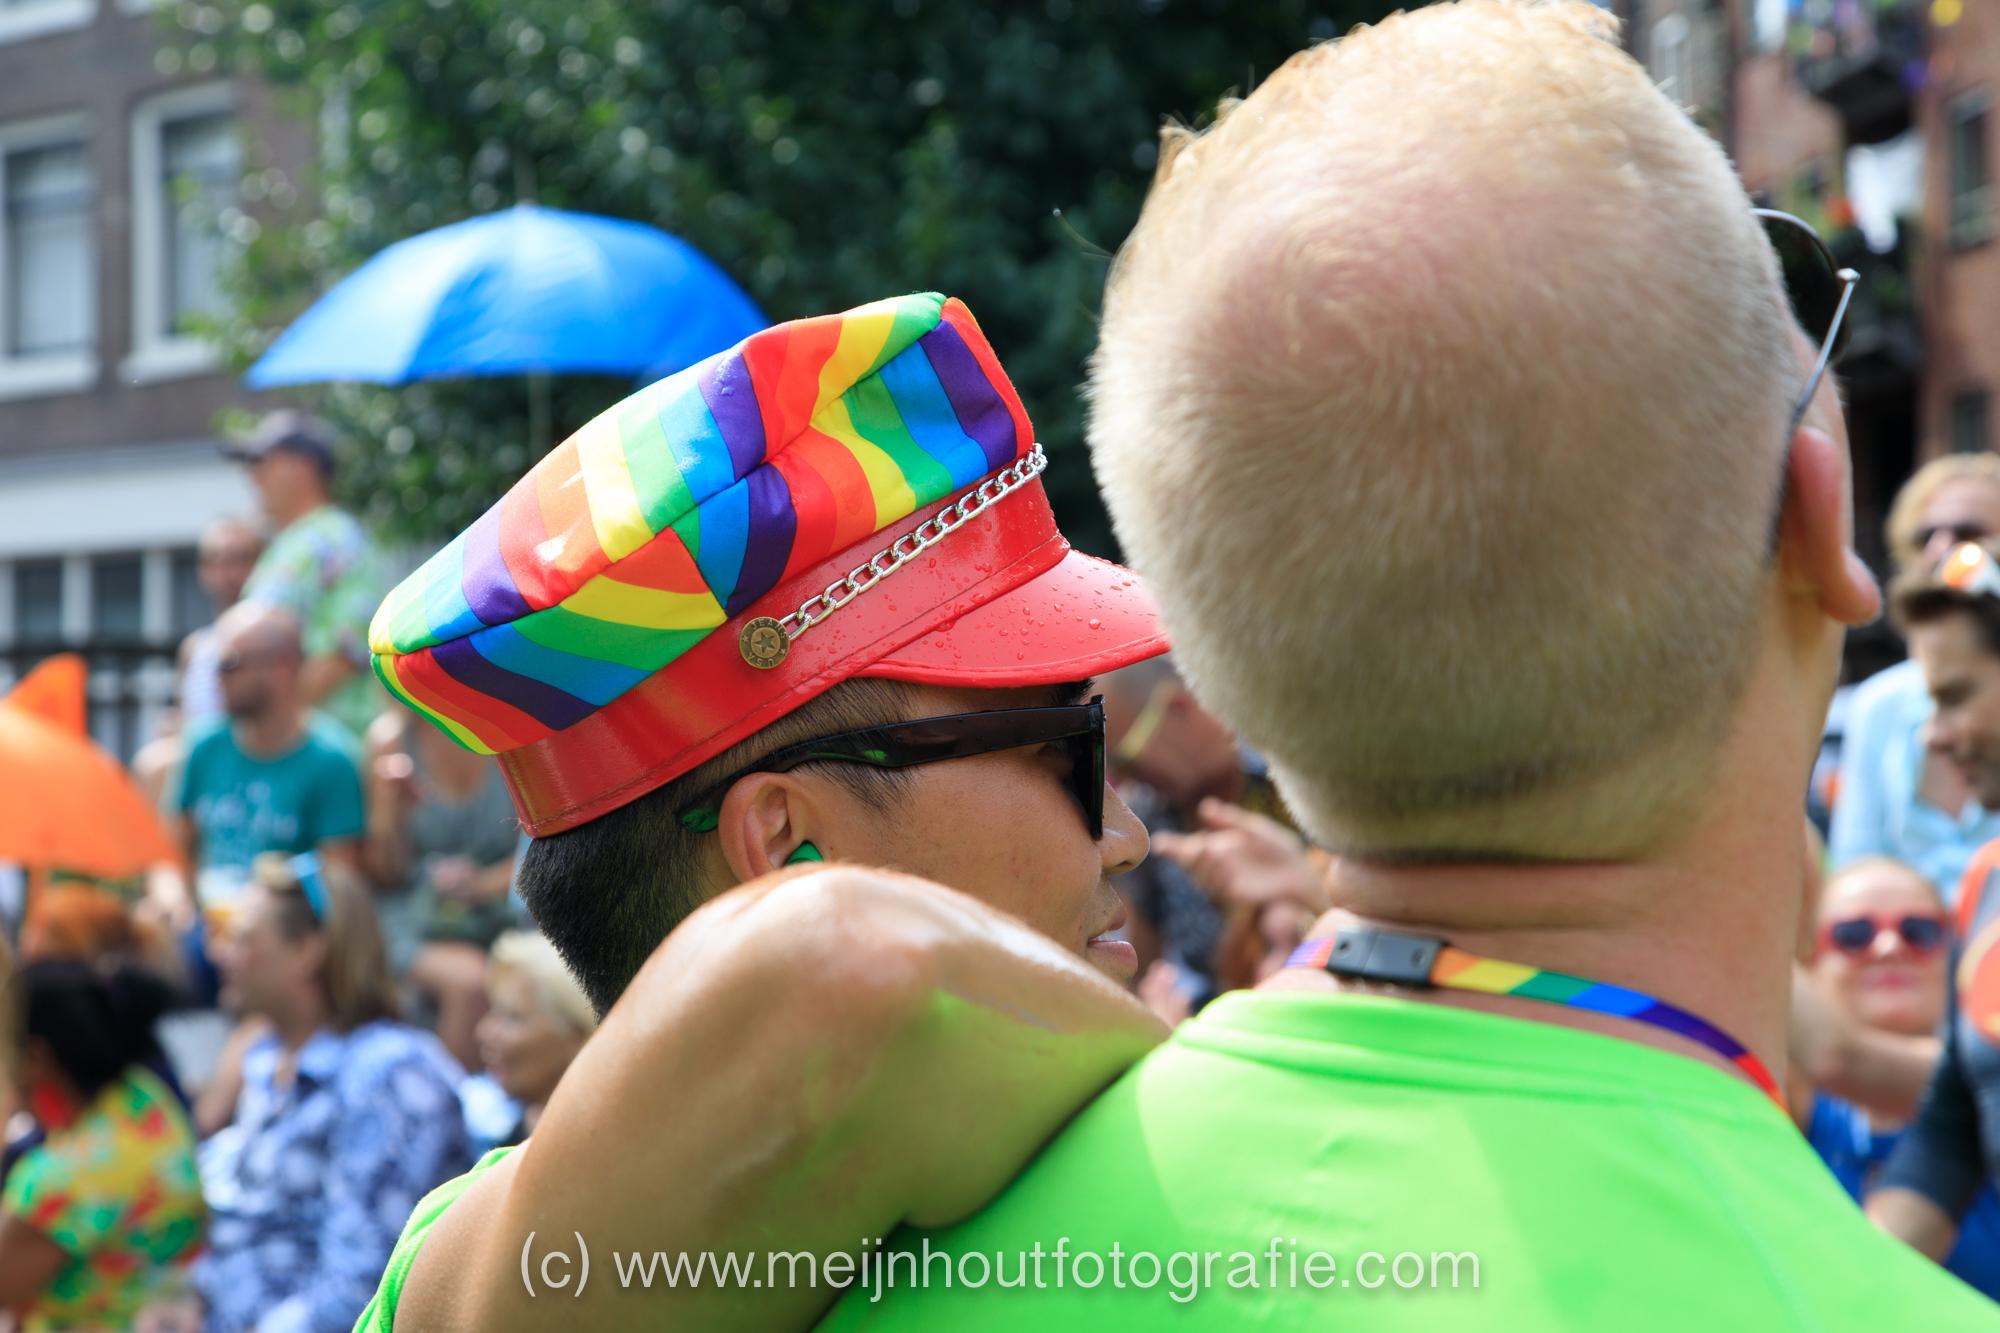 20180804-_MG_0477 Deloitte Gay Pride 2018.jpg